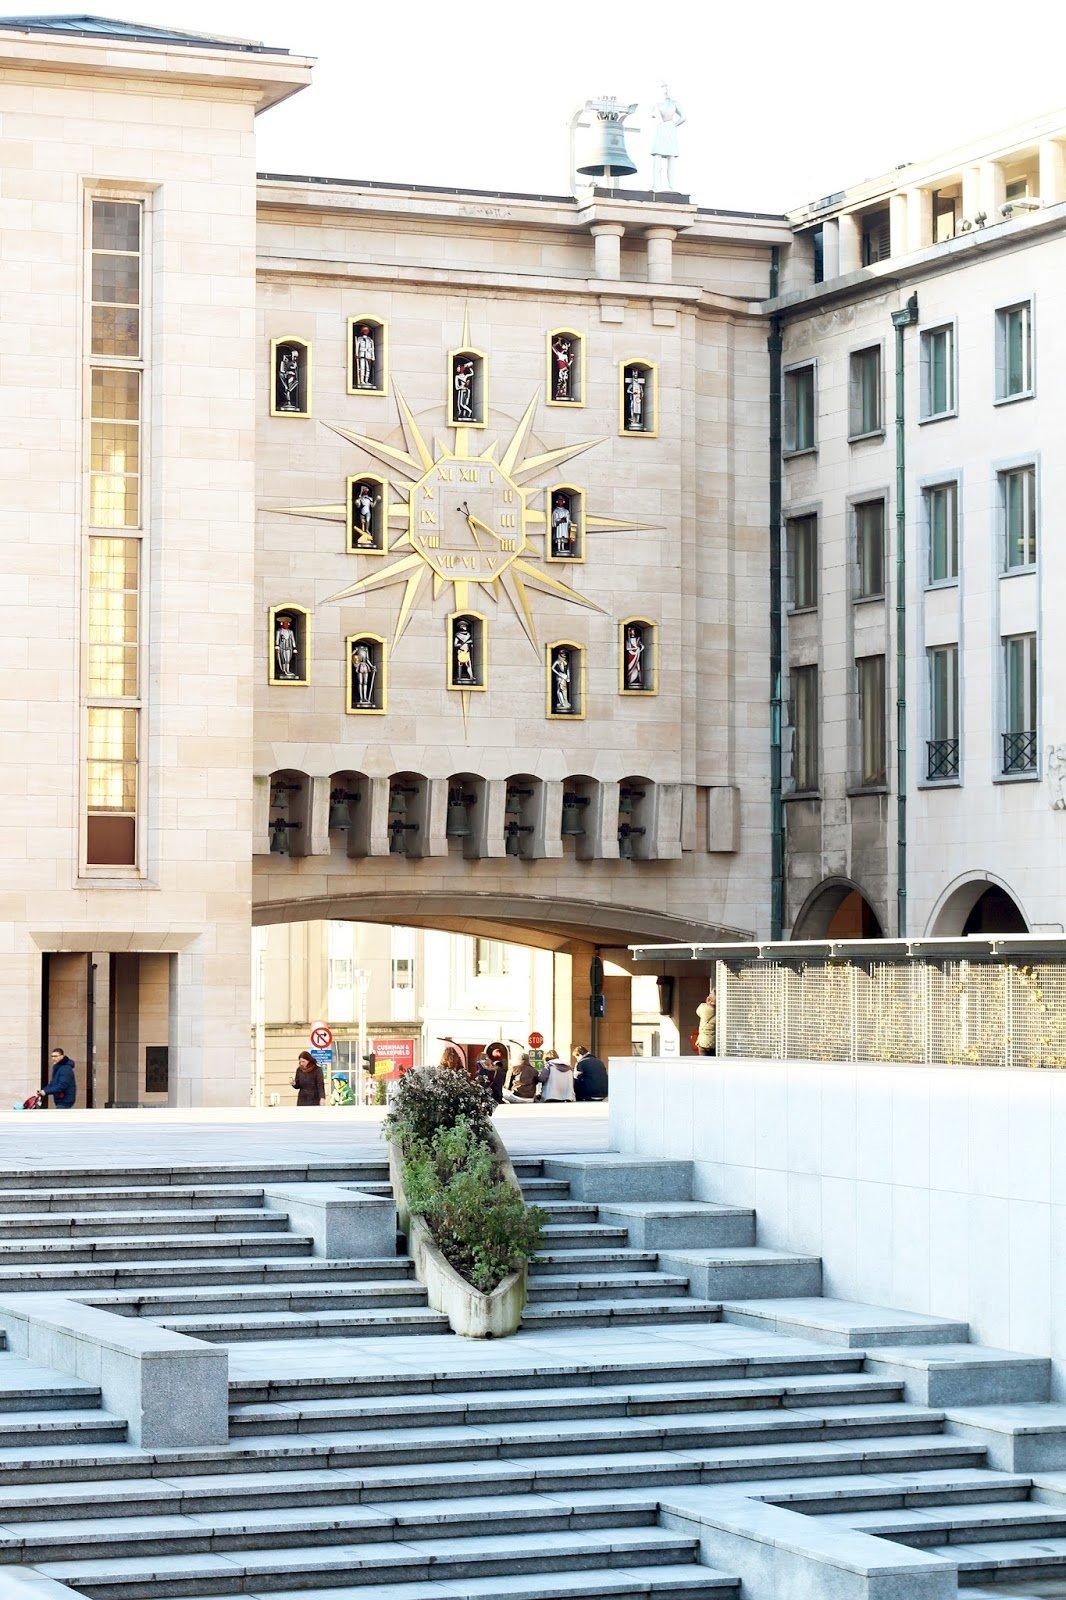 Bruxelles horloge europe